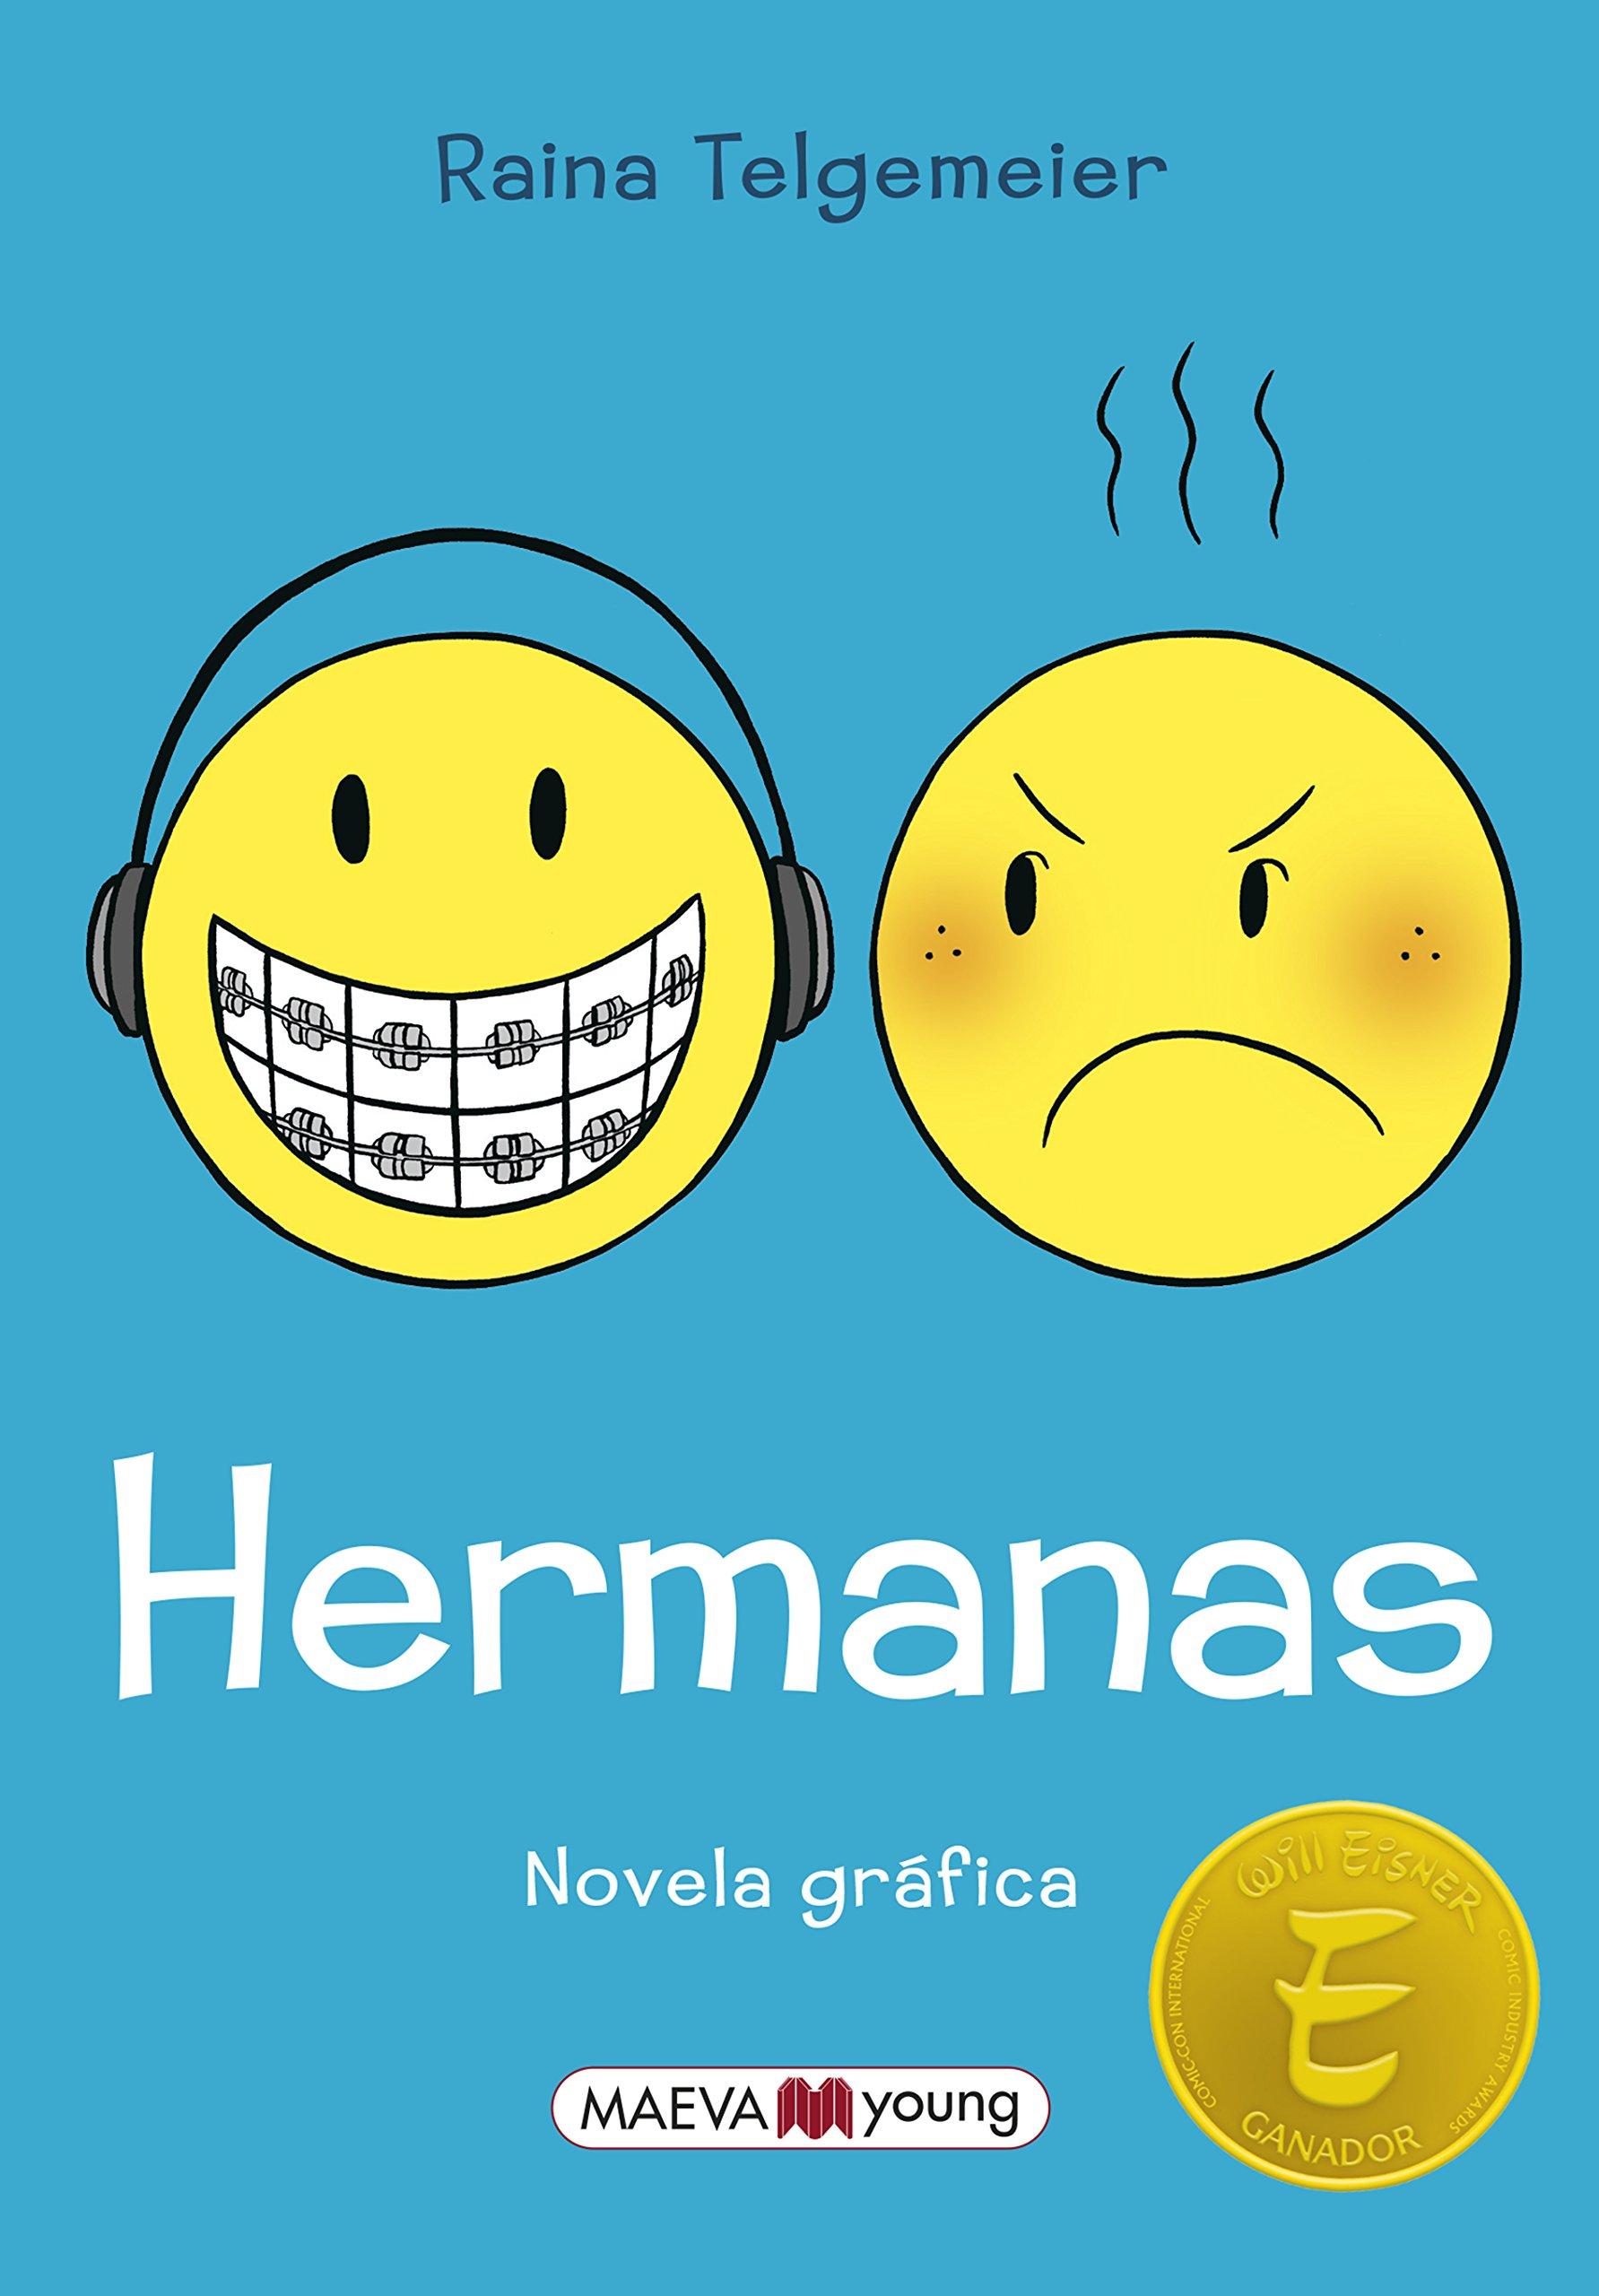 Hermanas (Novela gráfica): Amazon.es: Raina Telgemeier ...